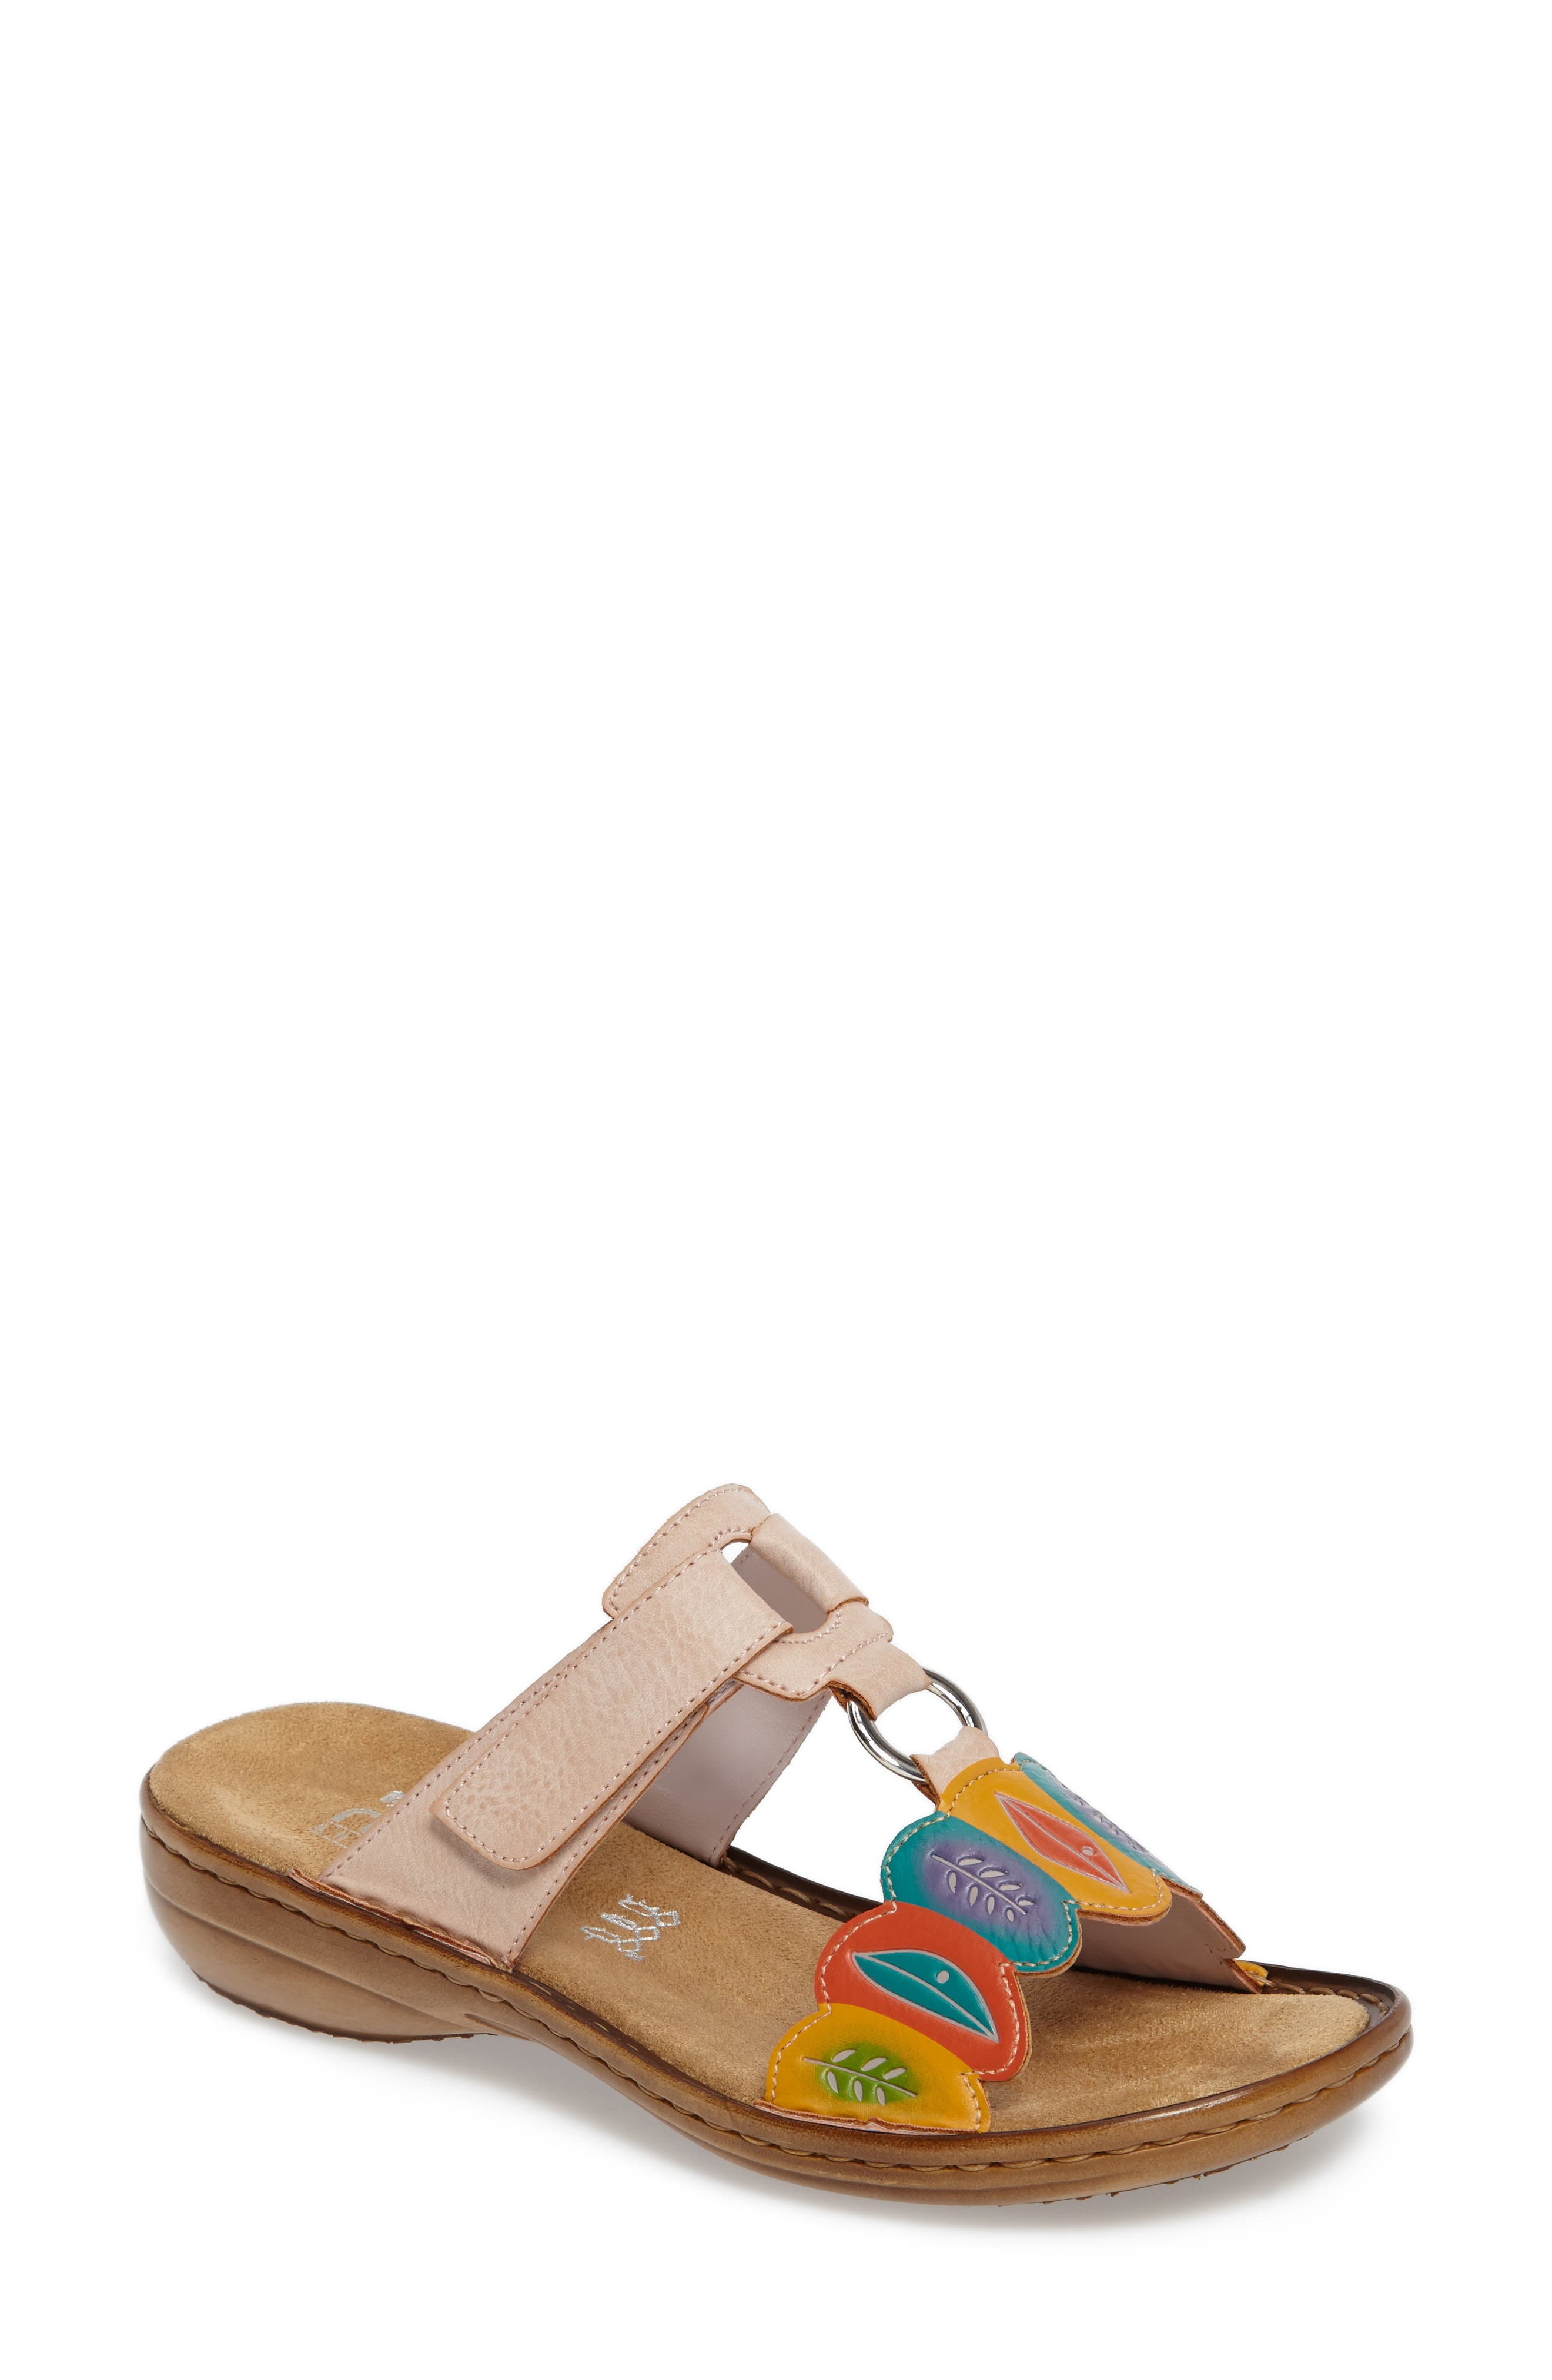 Alternate Image 1 Selected - Rieker Antistress Regina R4 Slide Sandal (Women)